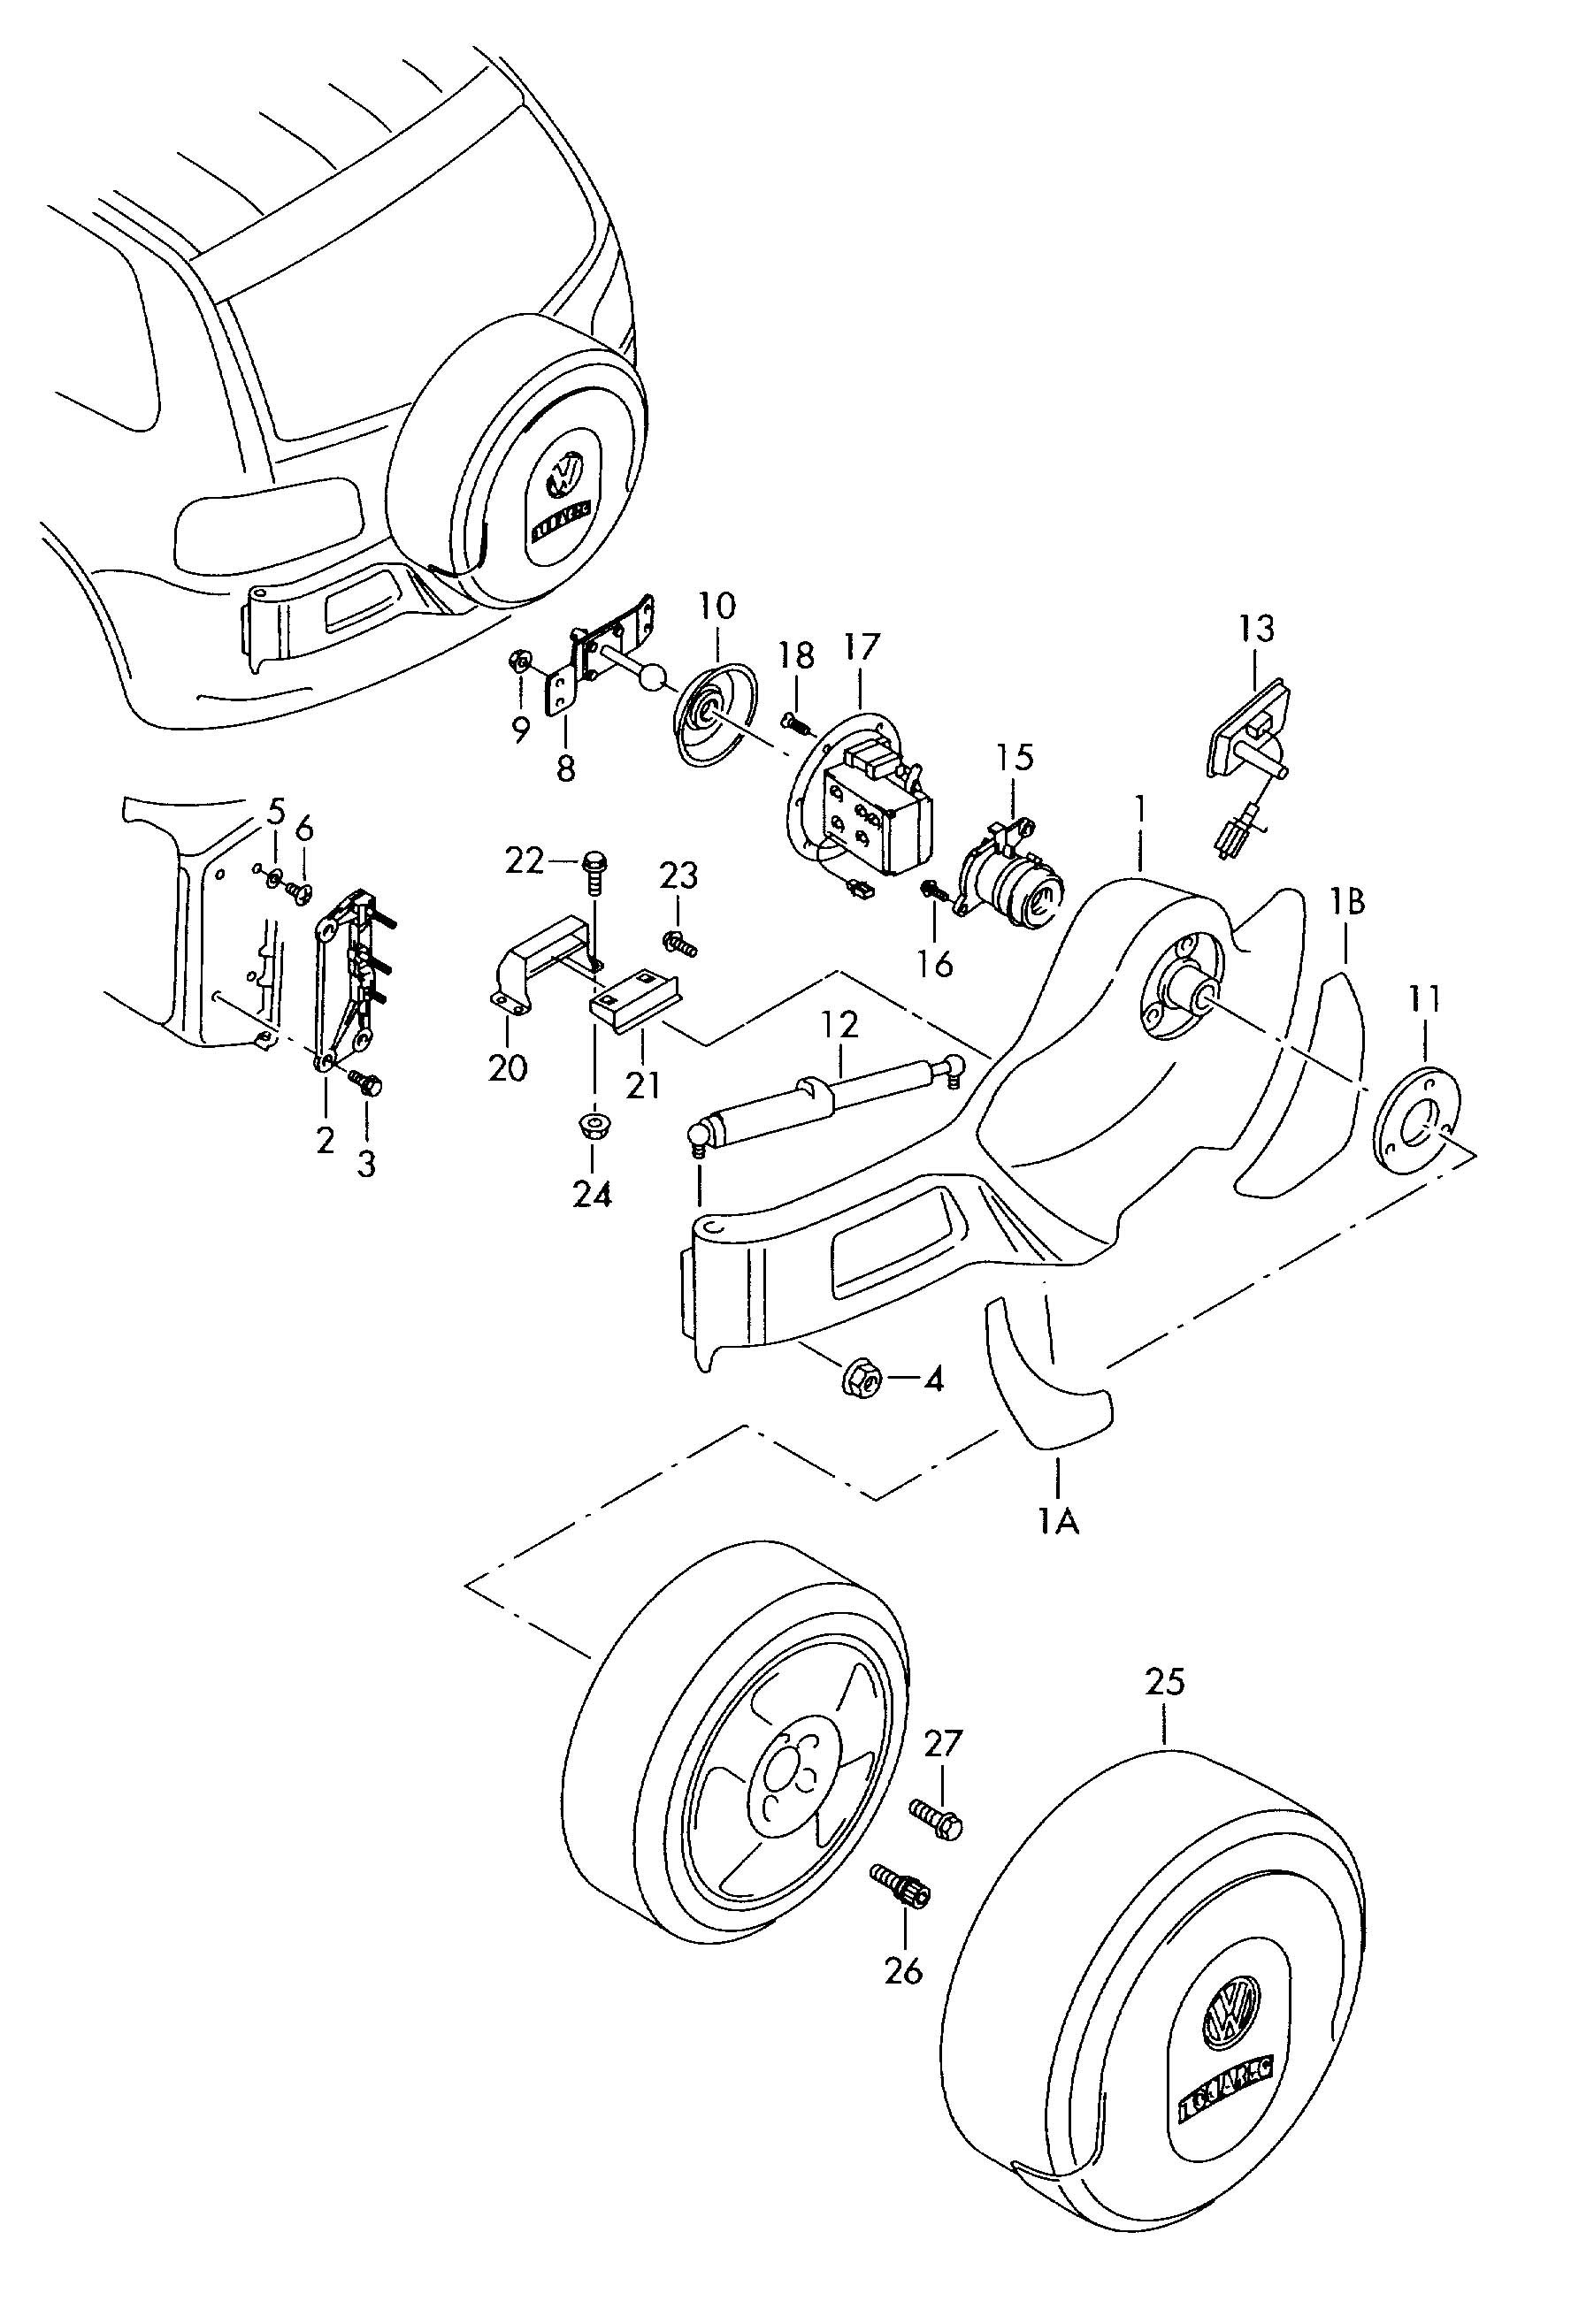 Volkswagen Touareg Lock